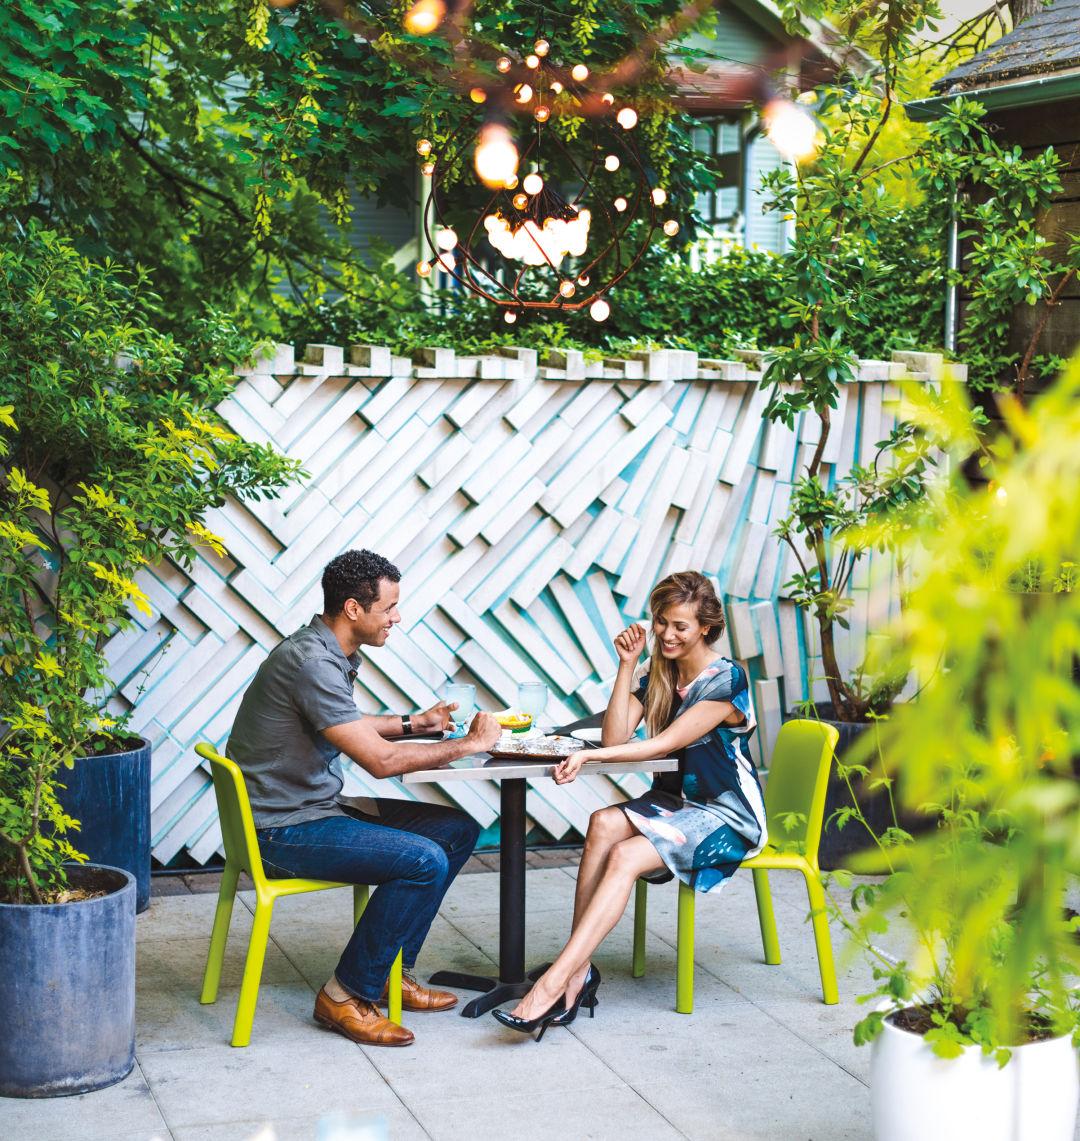 37 Ways To Savor Your Summer: 11 Amazing Ways To Savor Summer In Portland